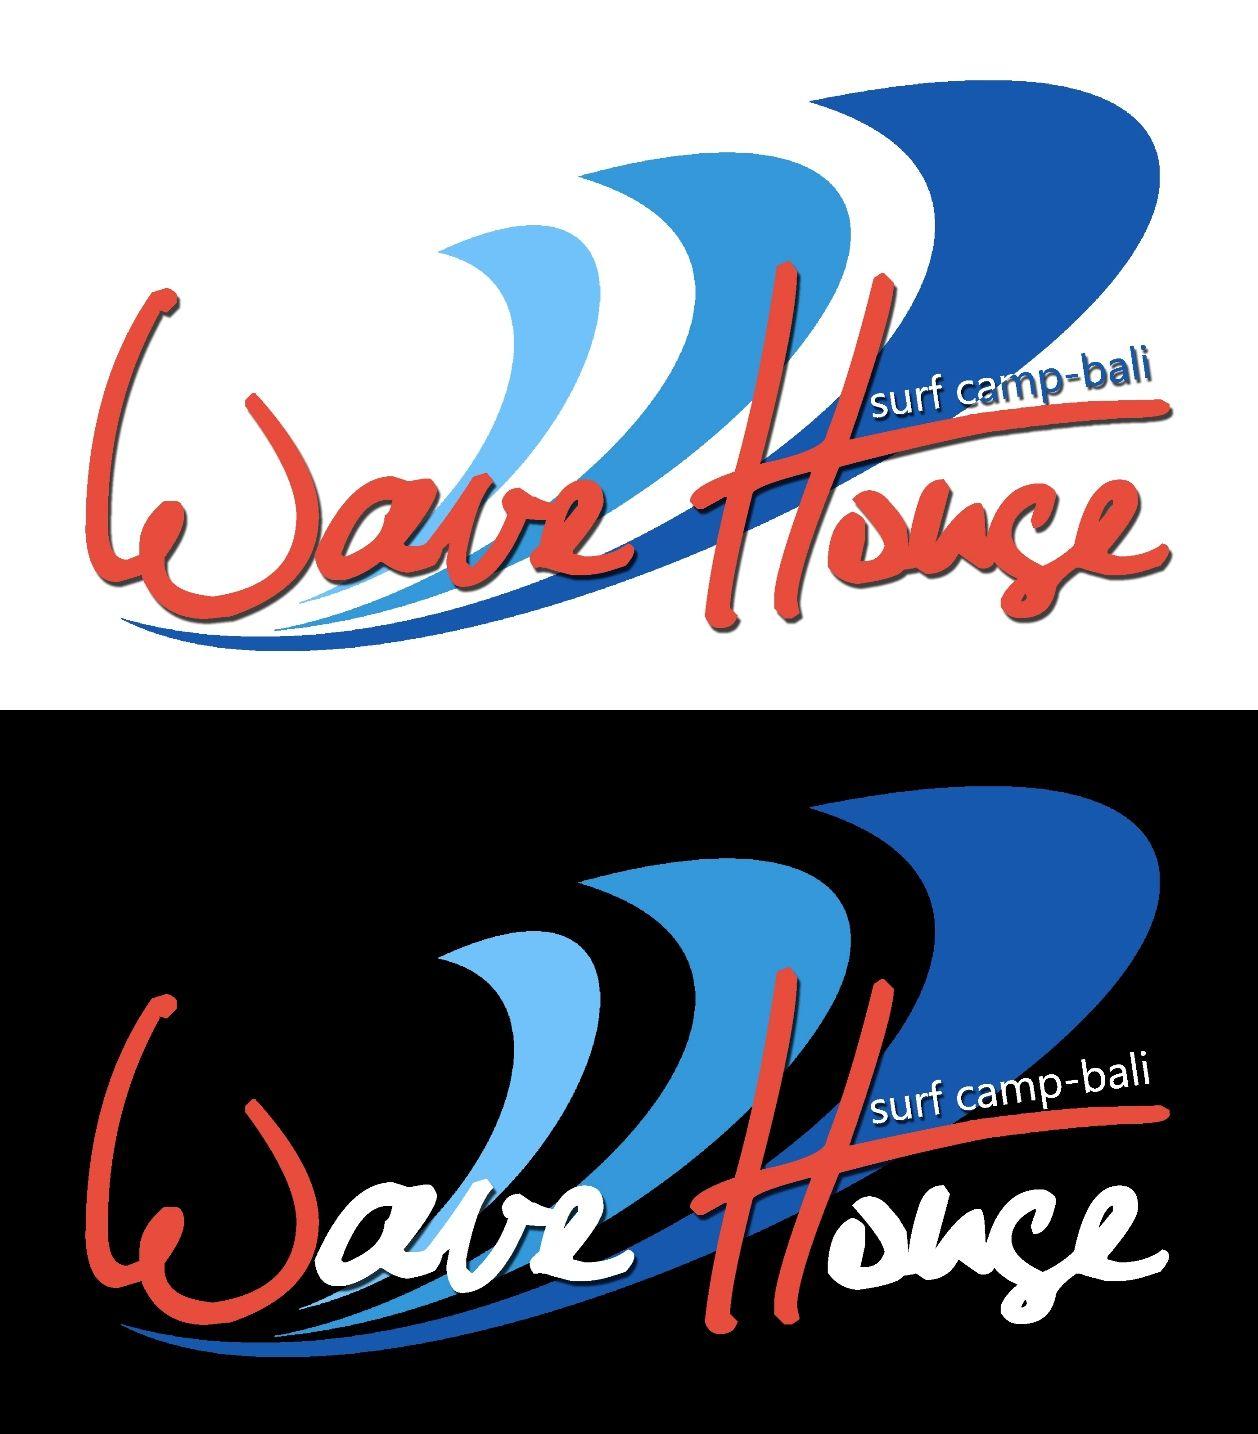 Редизайн логотипа для серф-кэмпа на Бали - дизайнер AkioShion